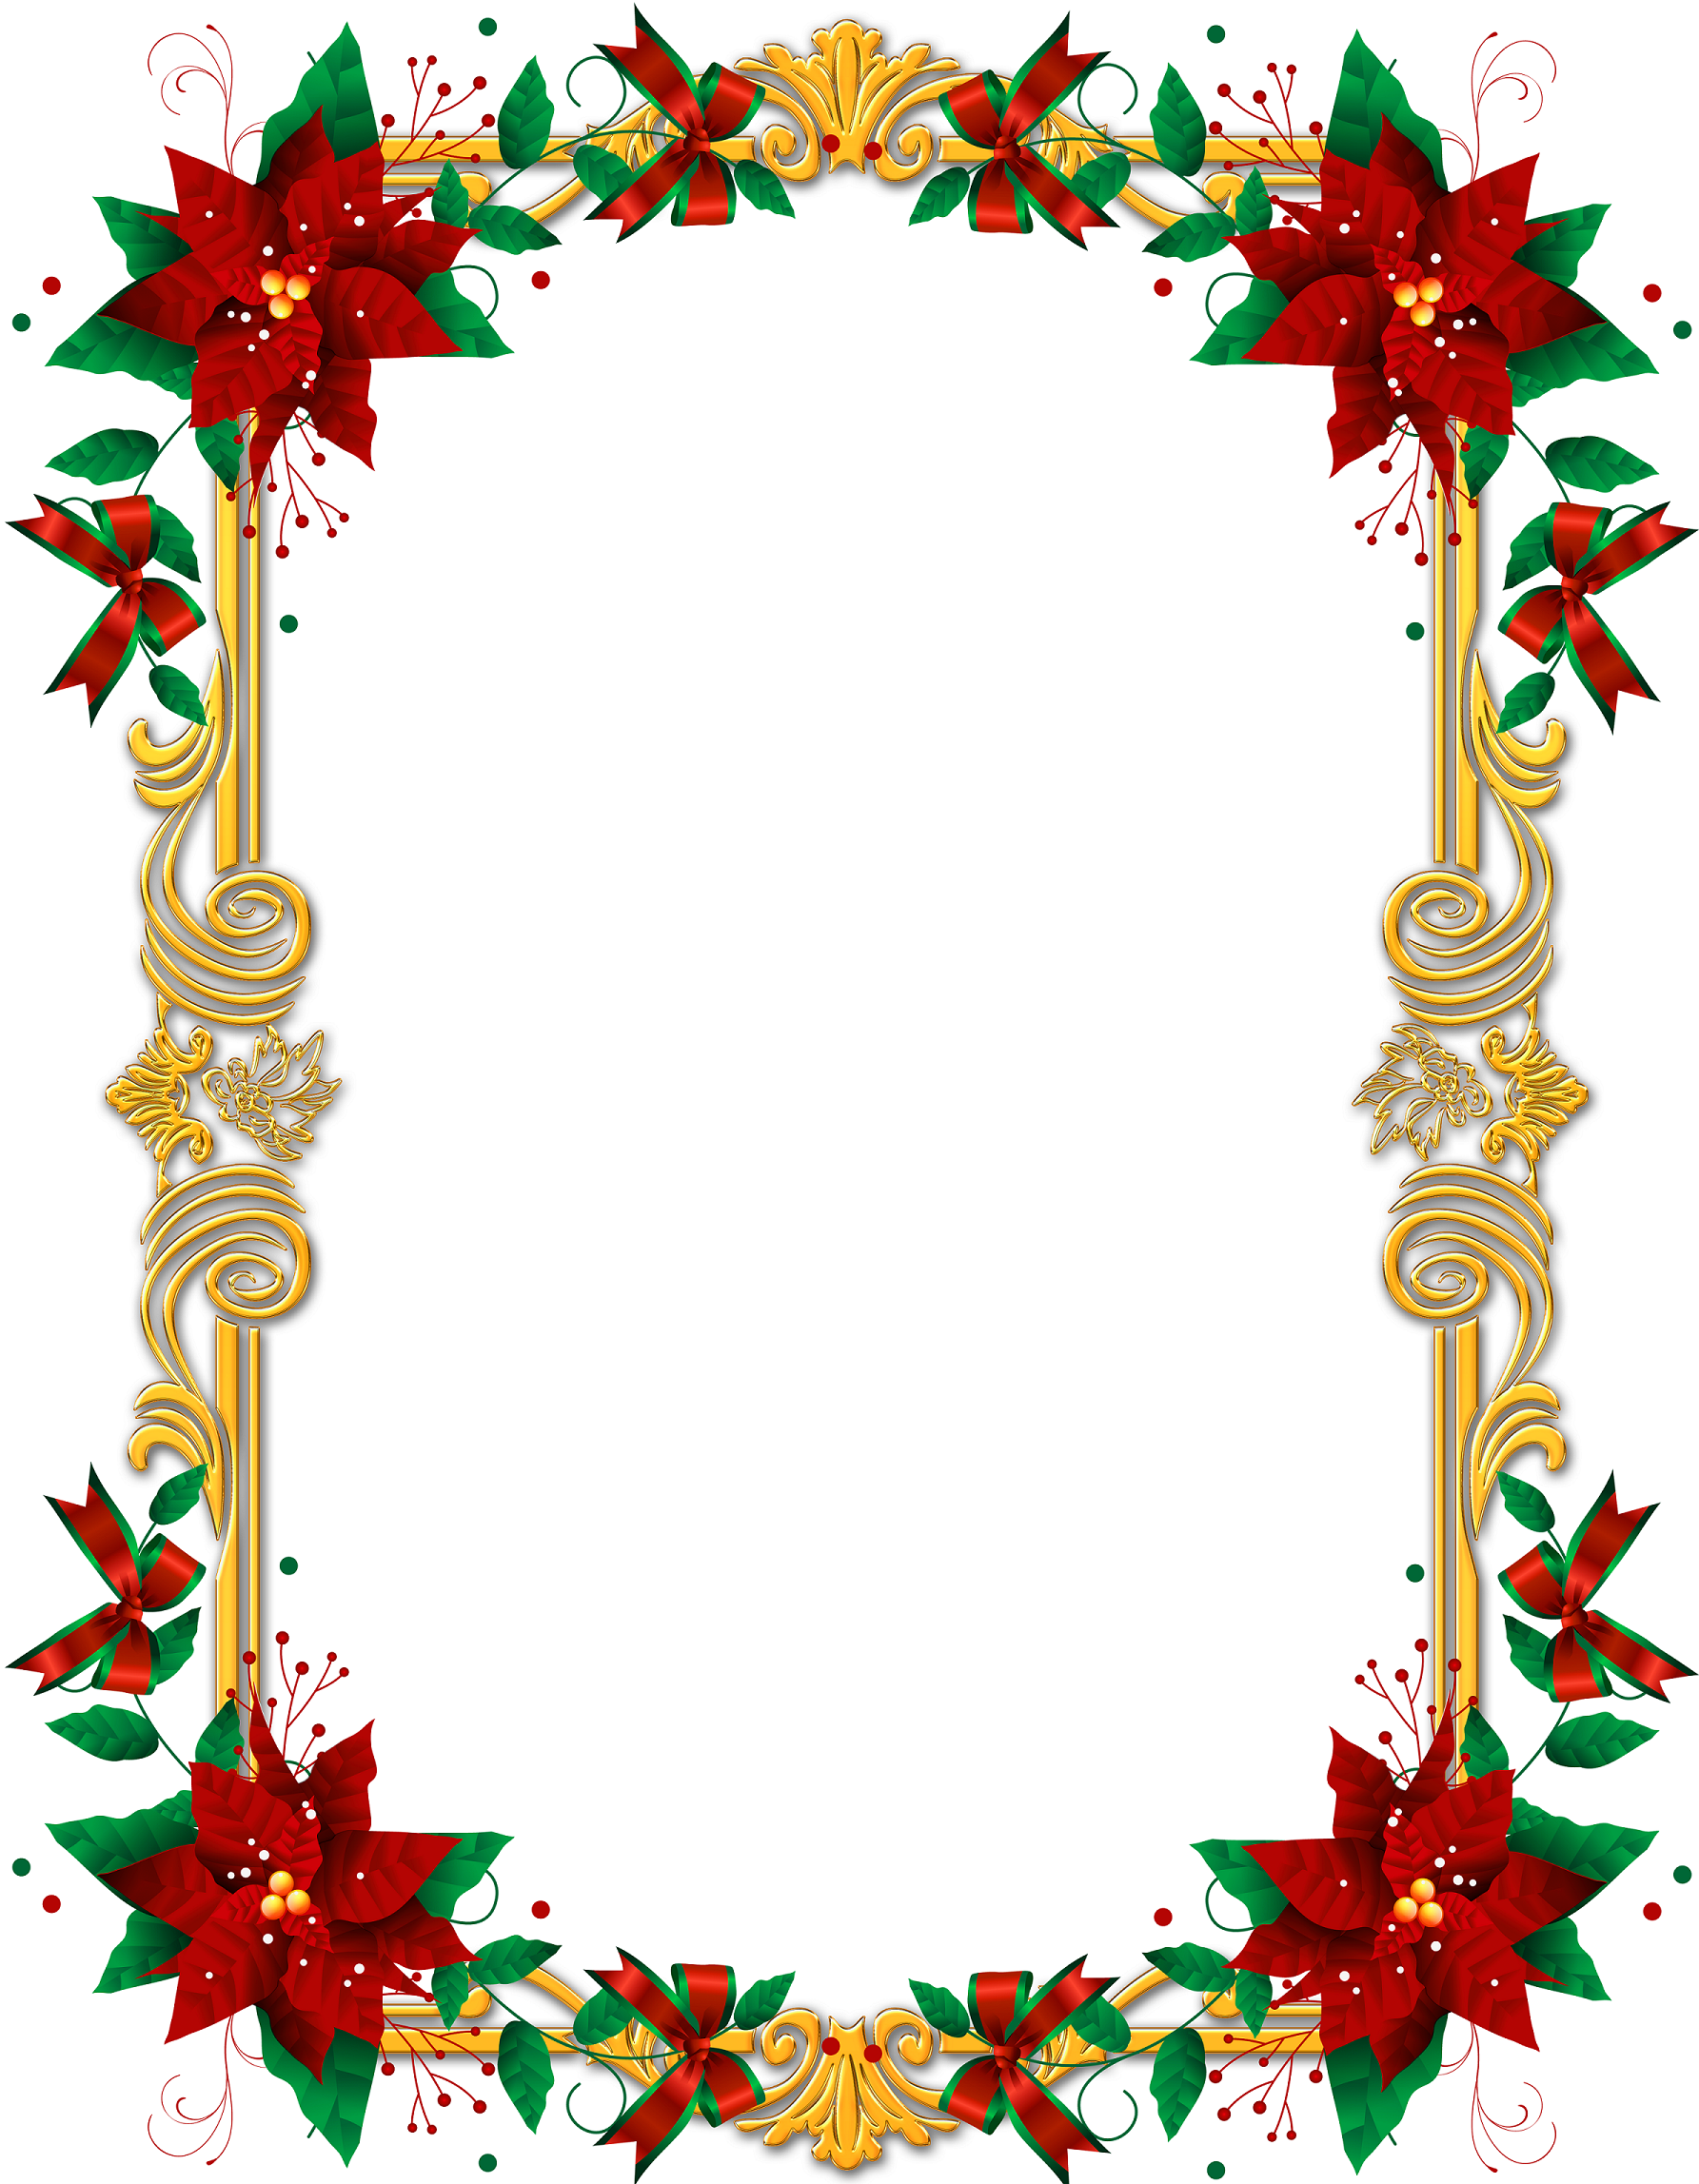 Poinsettia clipart christmas deco Frame poinsettia poinsettia  frame